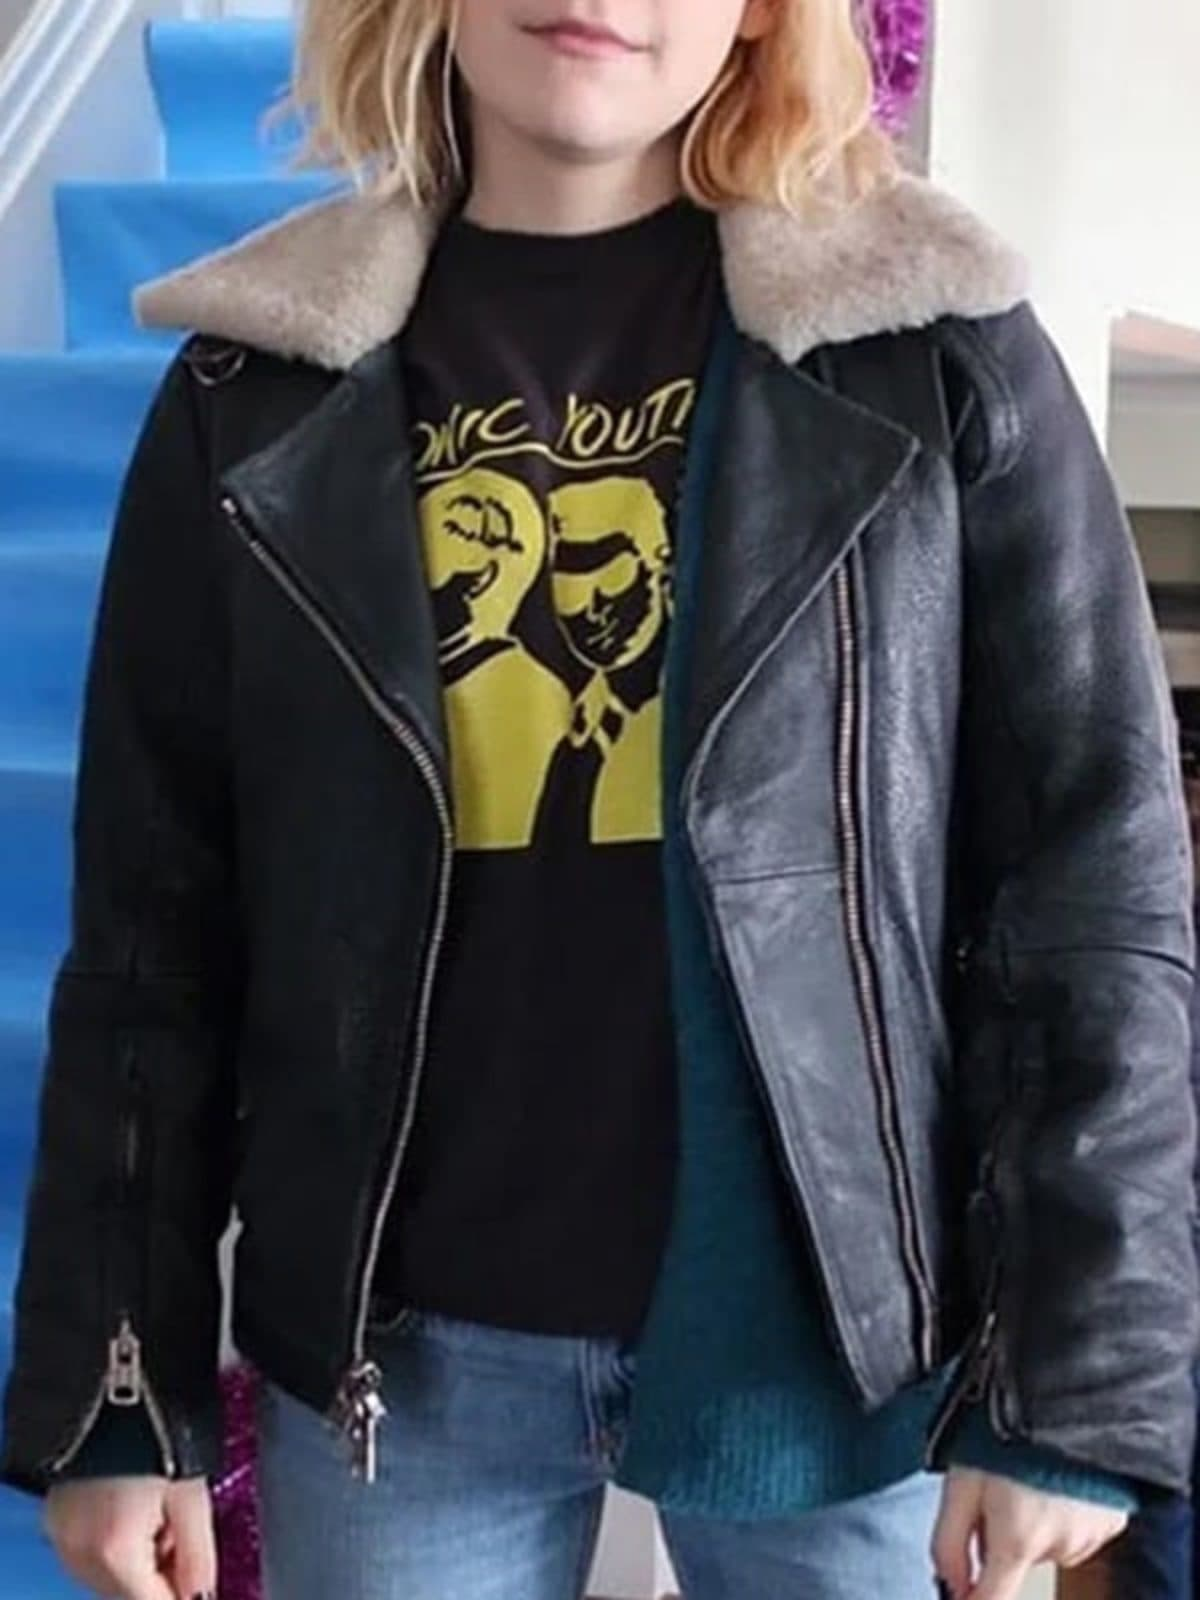 Angie Let It Snow Kiernan Shipka Leather Jacket